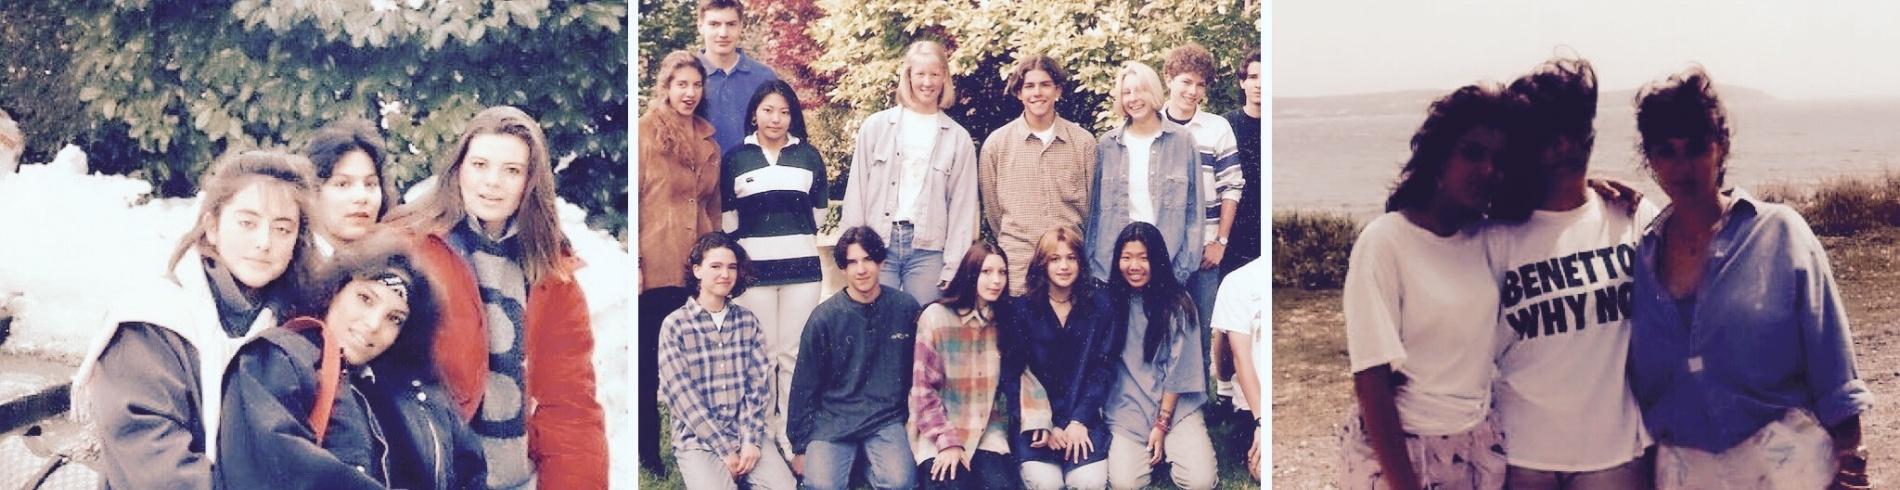 203-old-photos-alumni-brillantmont.jpg